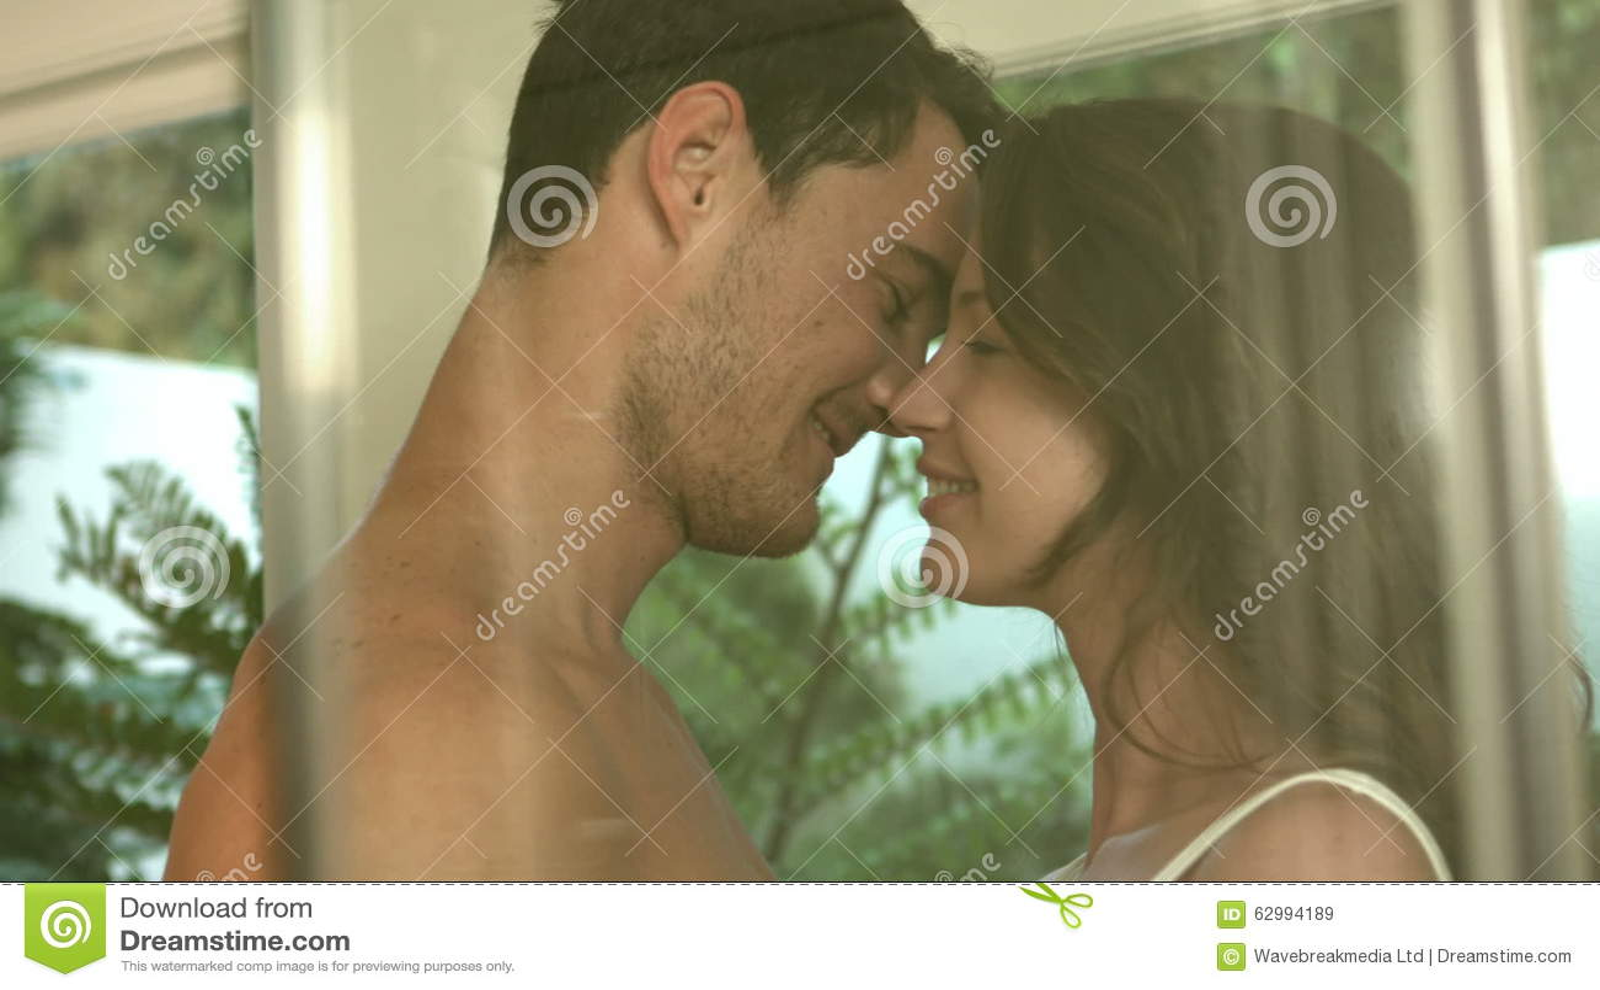 koppla in kyss definitionWashington Post mobila dating apps